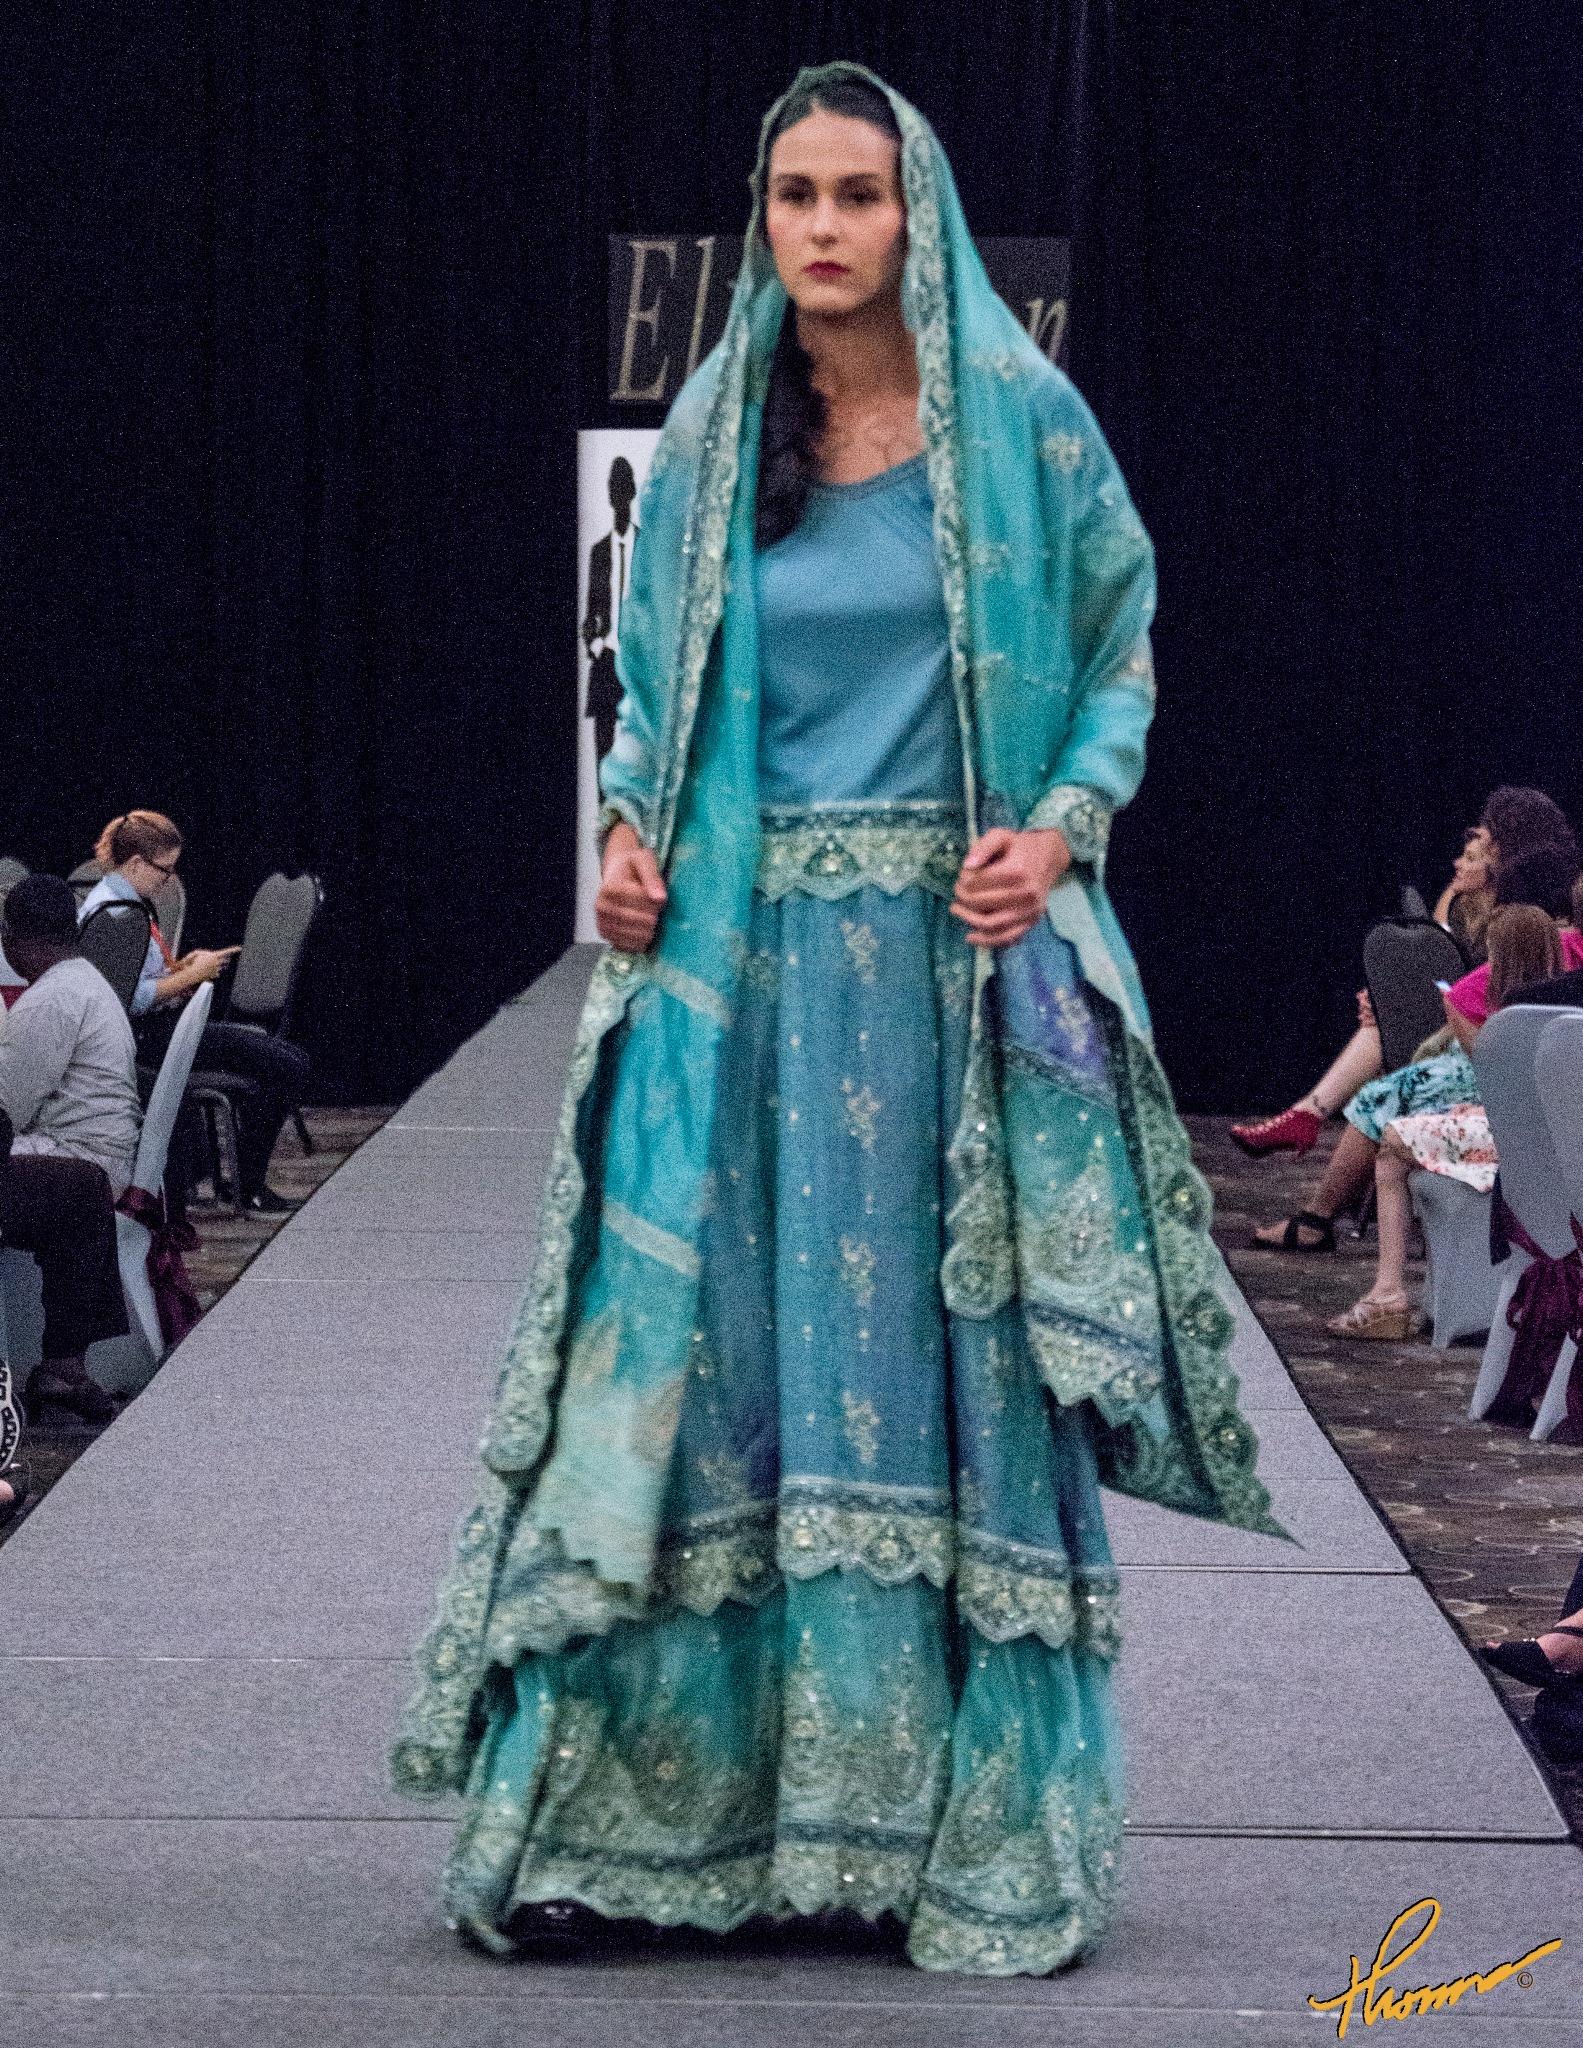 India traditional wedding dress Photography by Thomas H Black Photography by Shameron Nicole Model